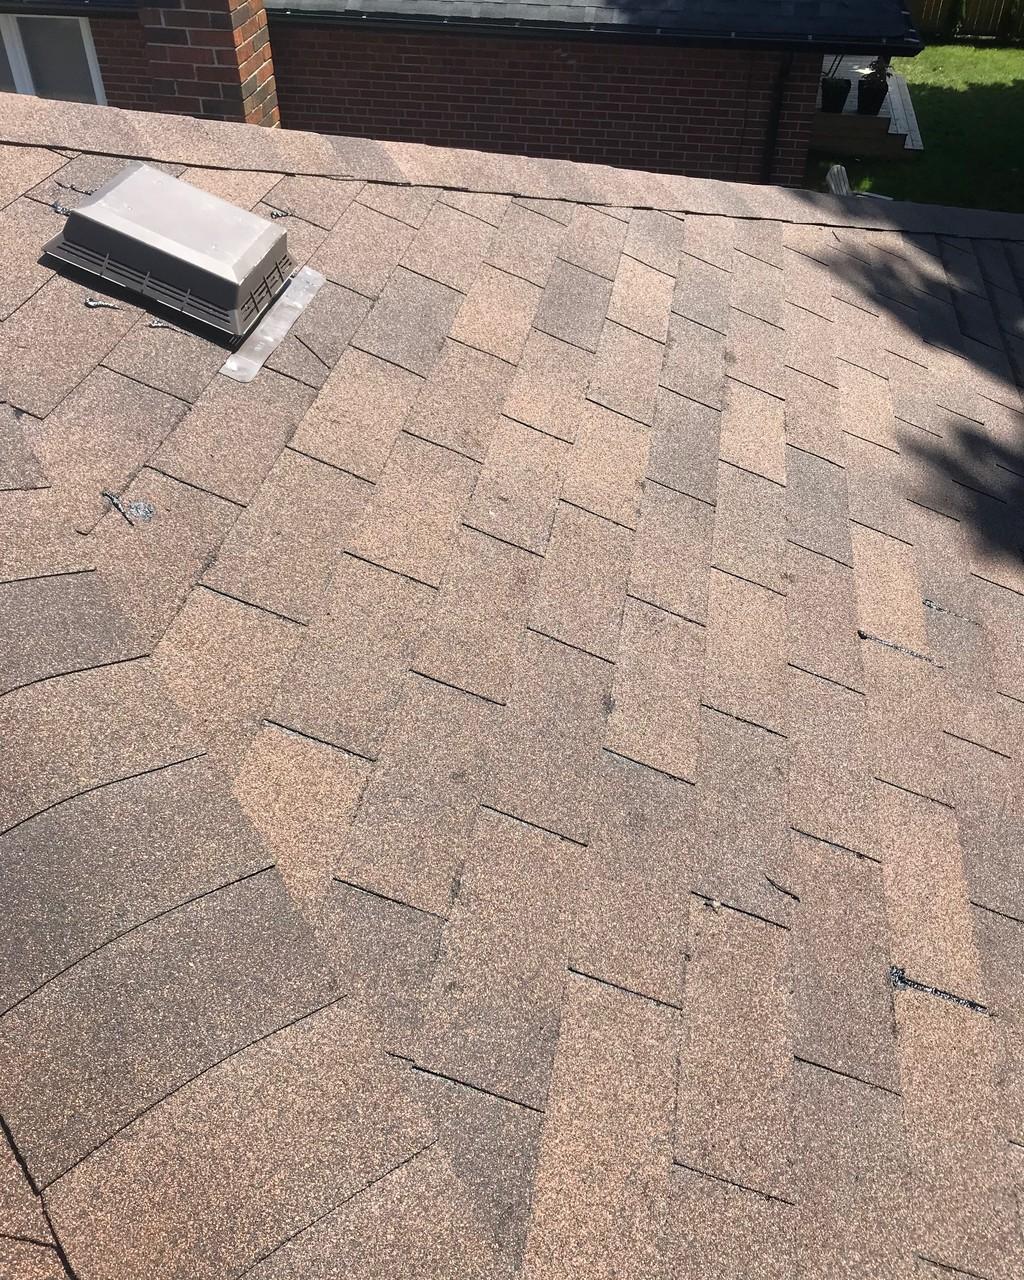 Install asphalt shingles to residential home in Don Mills